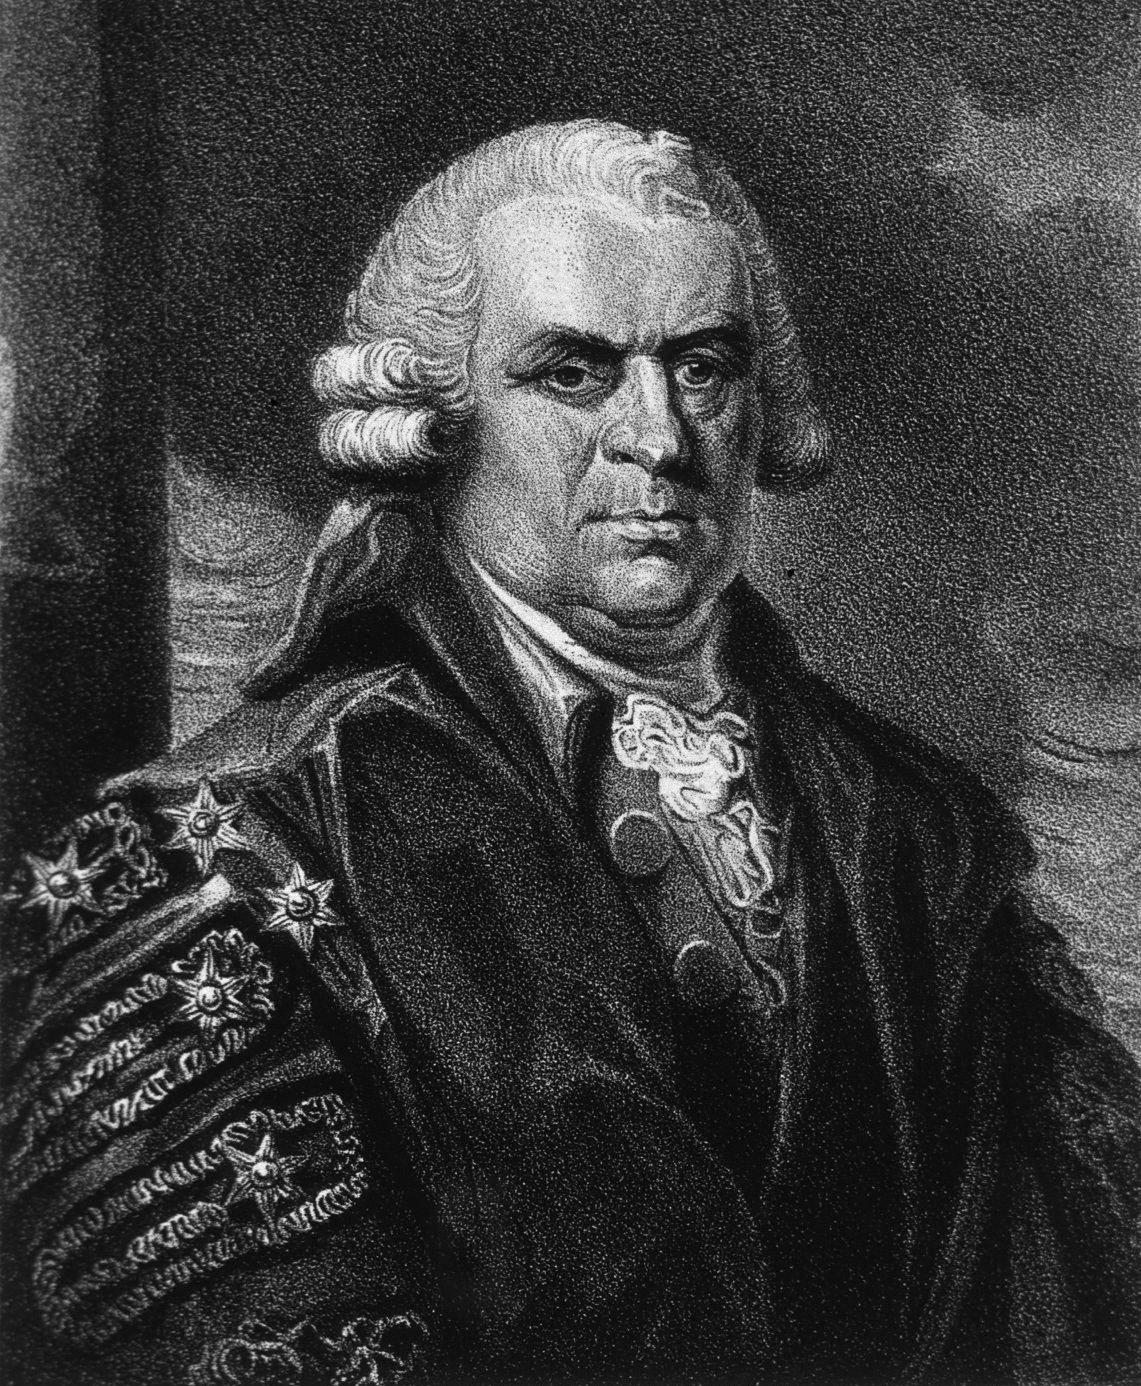 Sir George Baker, 1st Baronet - Wikipedia George Baker